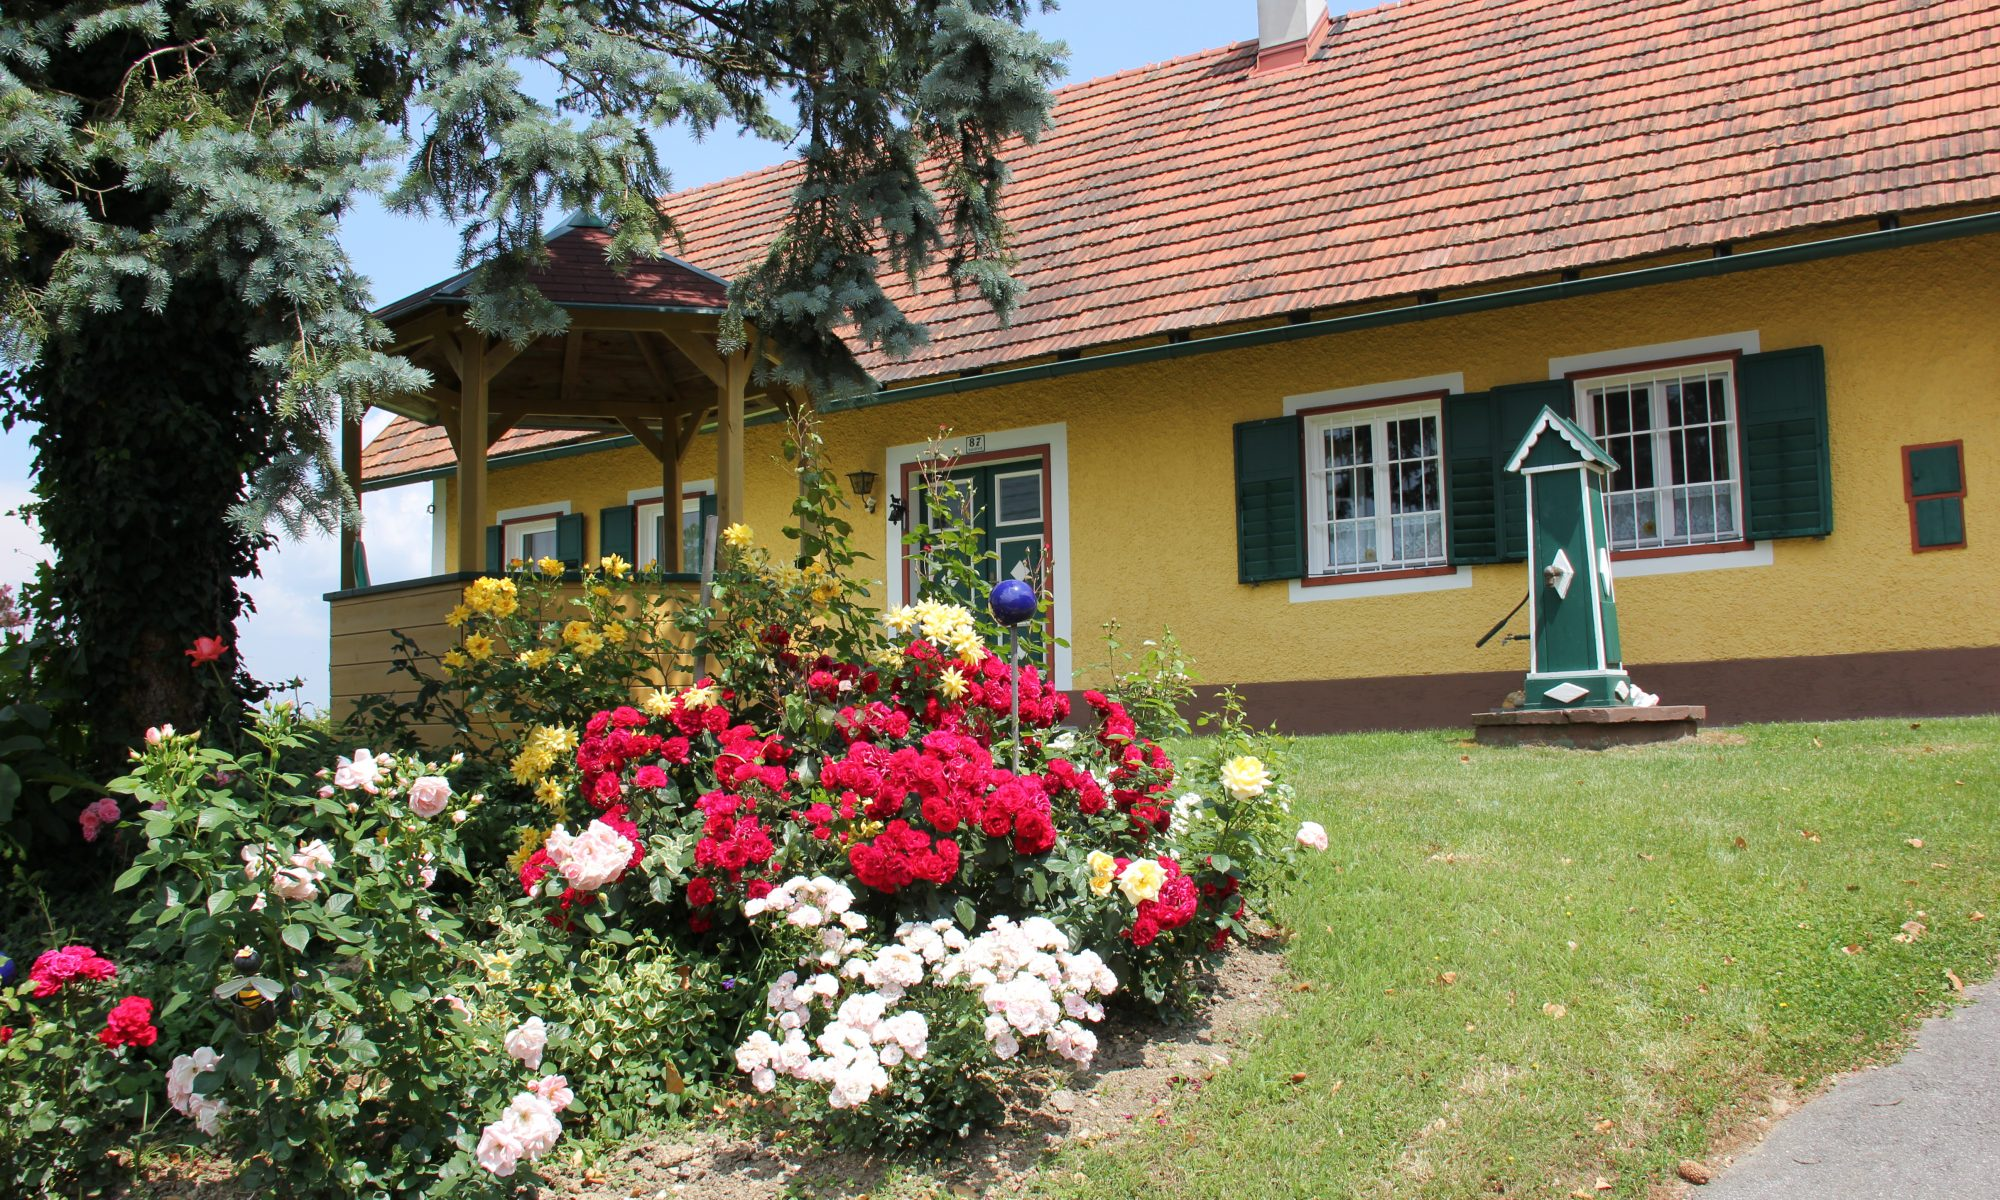 Ferienhaus Ronacher (c) Ulrike Elsneg